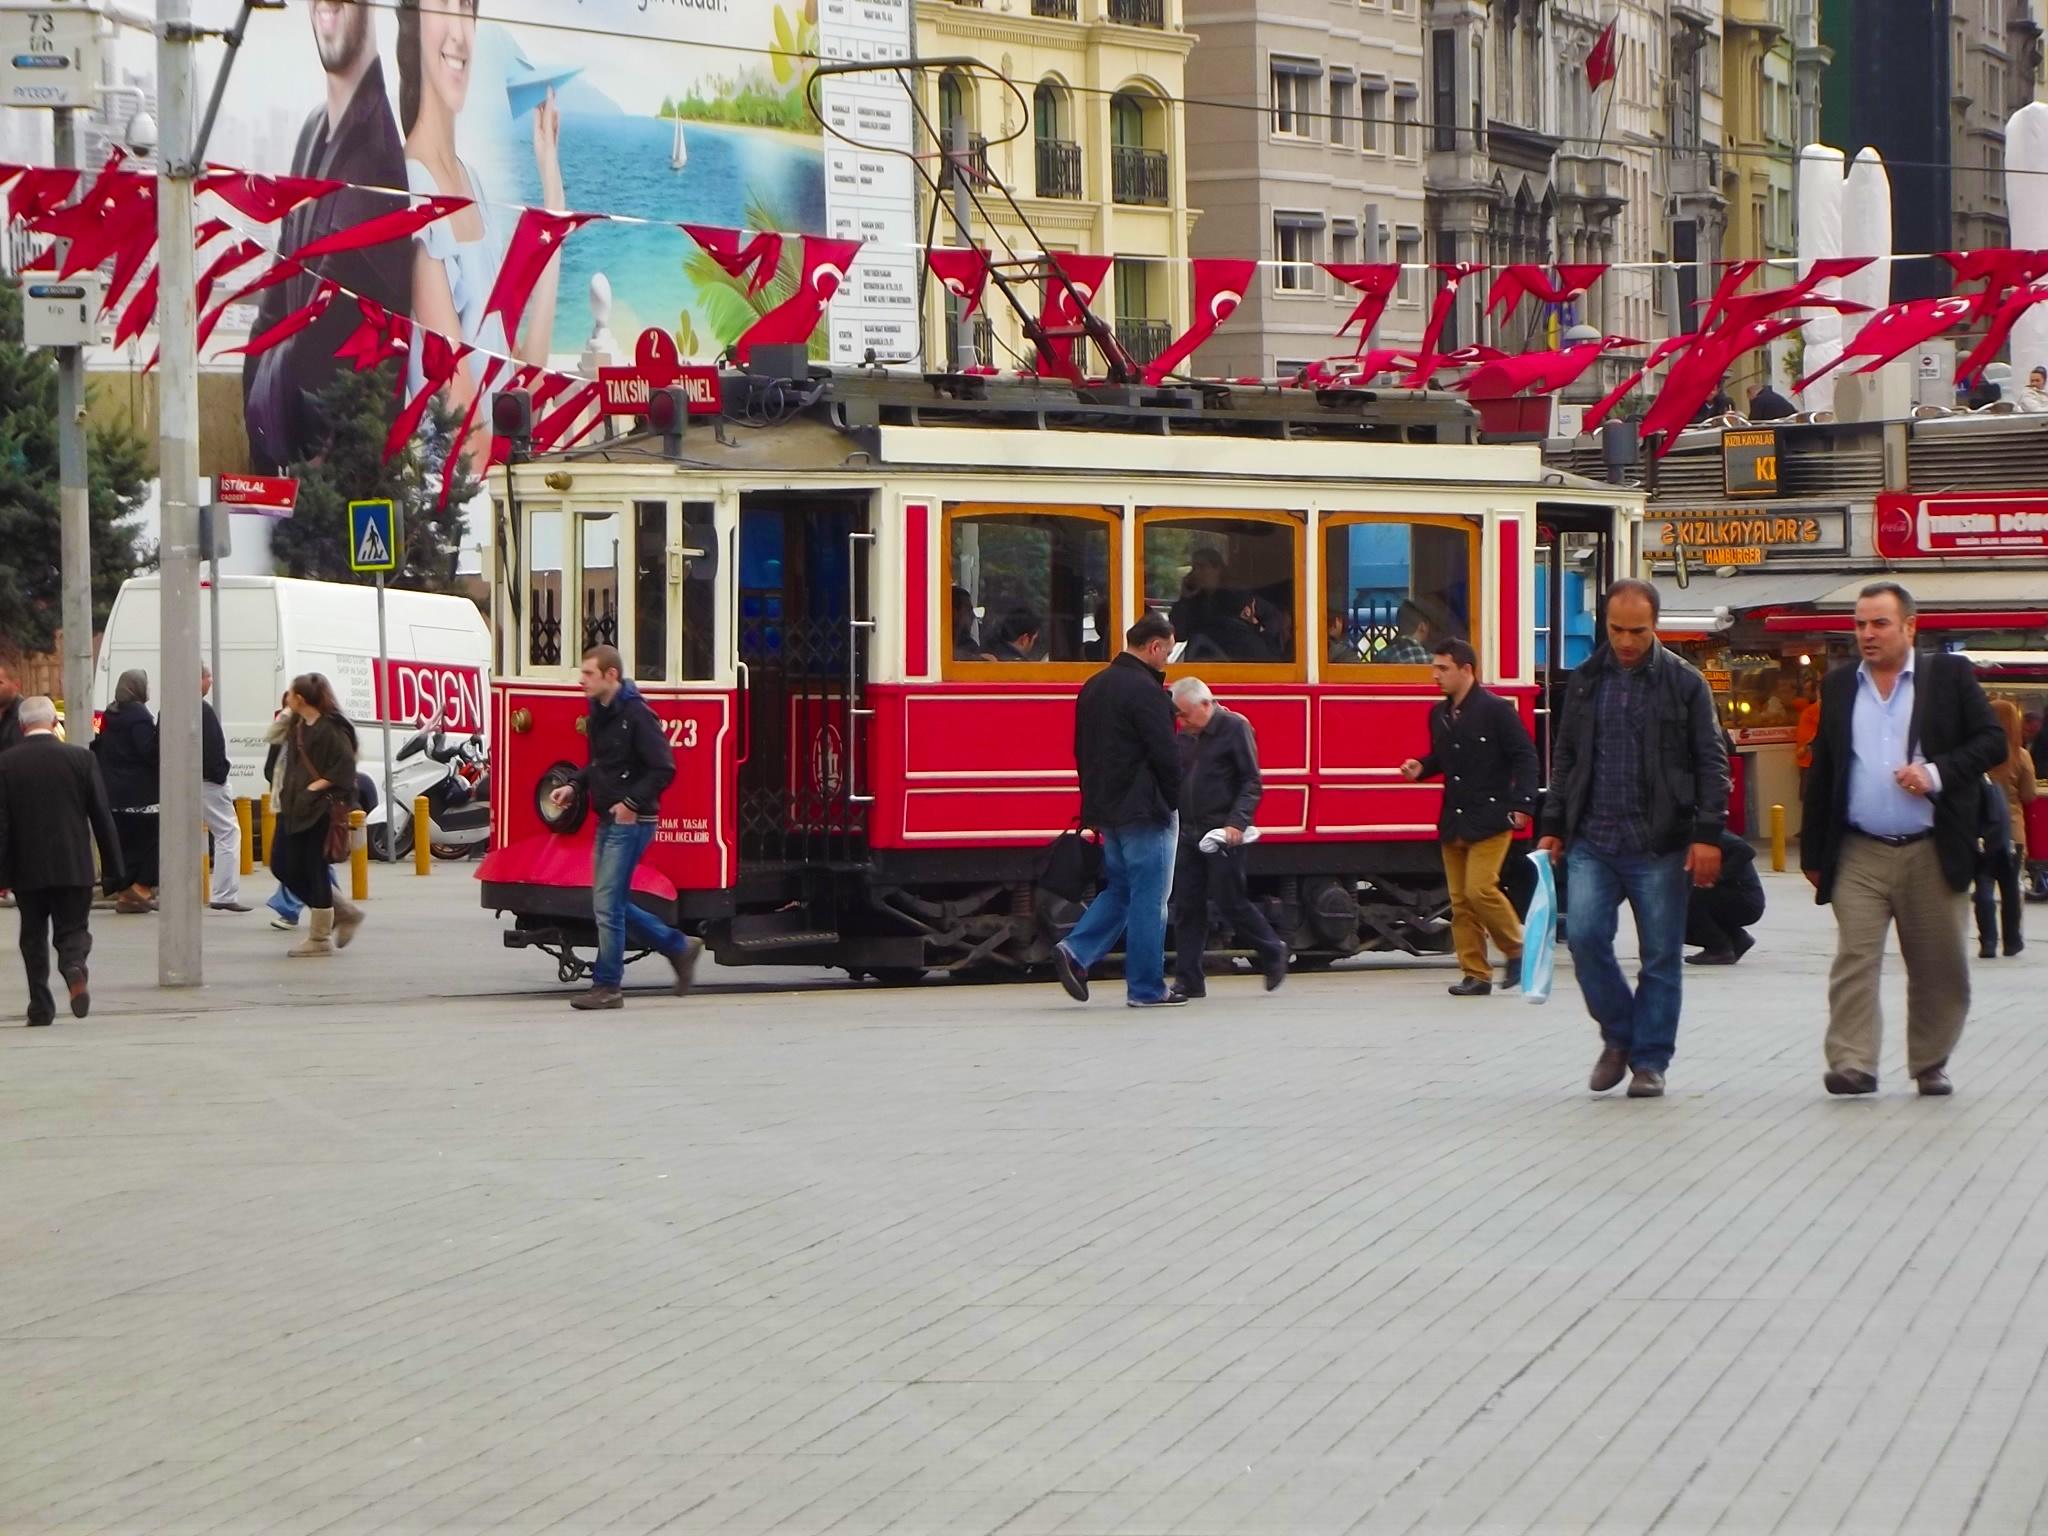 Istanbul 2013 by Kristian Stevens